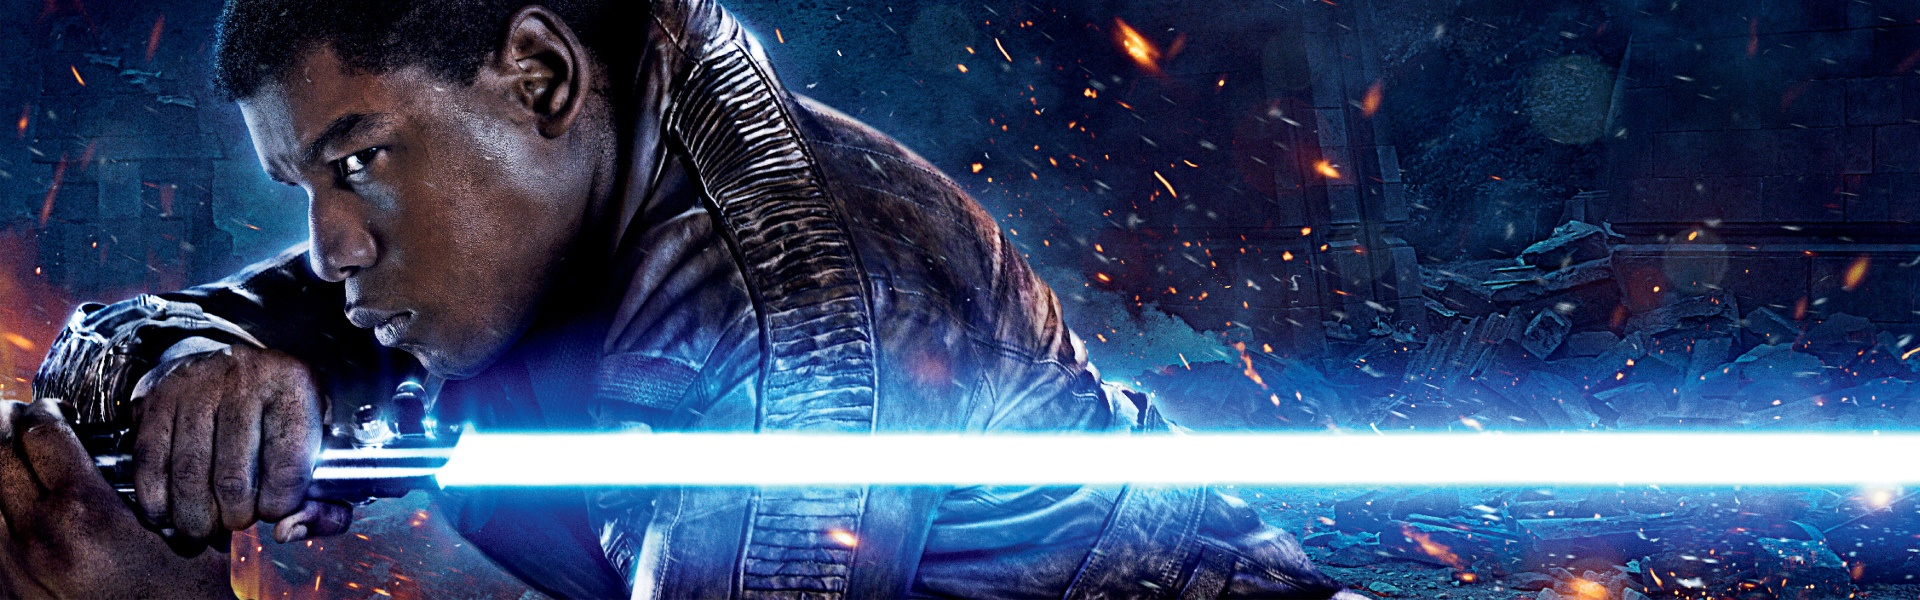 Star Wars Episode VII The Force Awakens Wallpaper 035